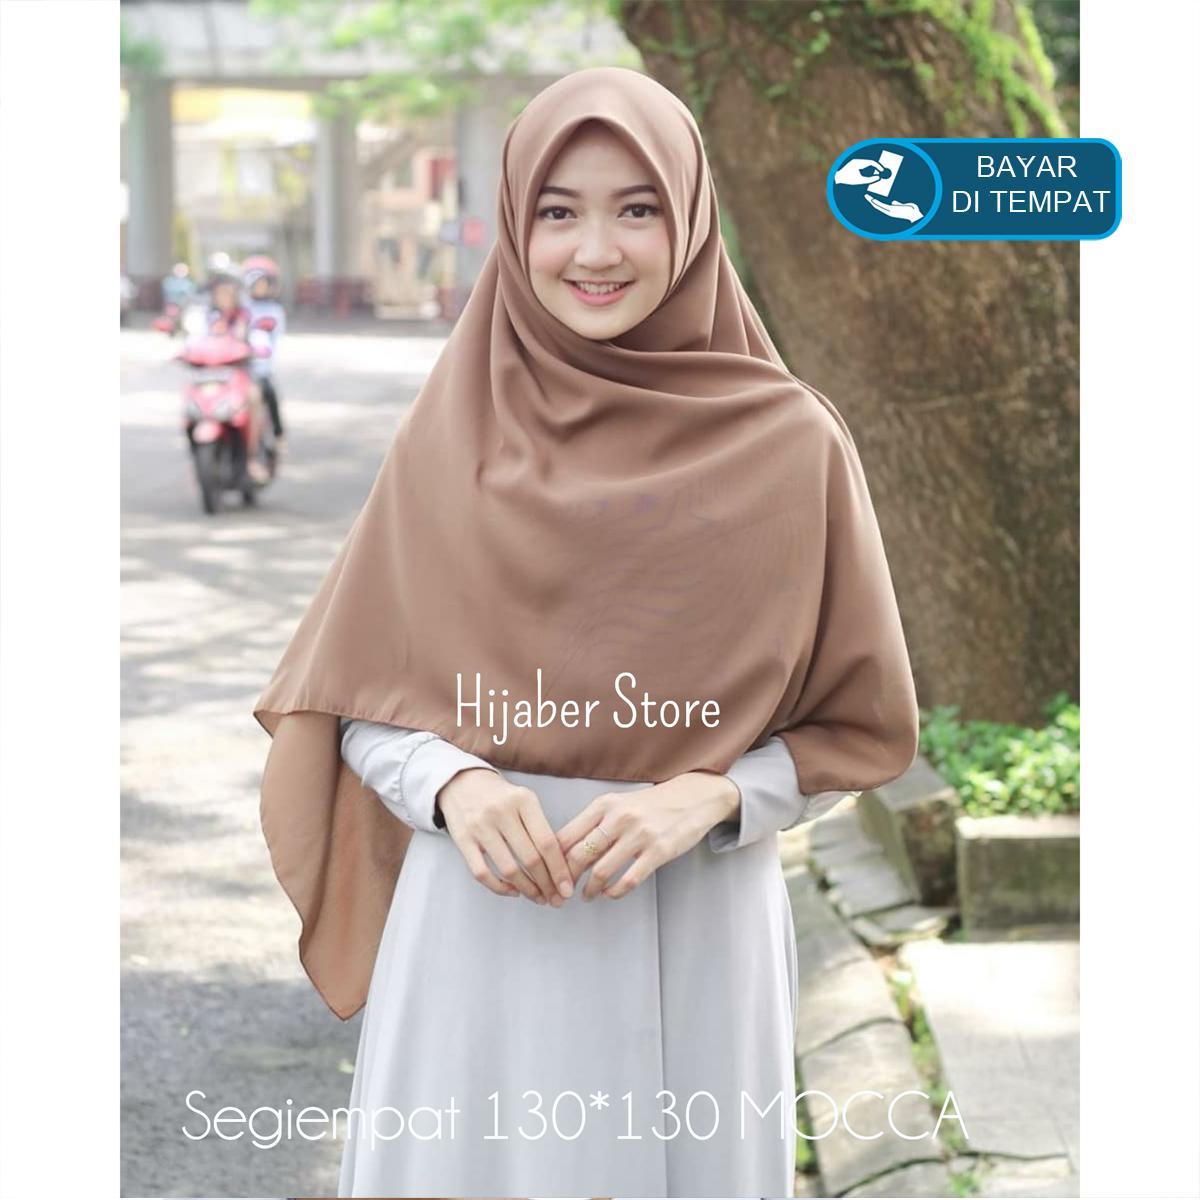 Jilbab / Hijab Segiempat 130x130 cm Wolfis - Kerudung Segi Empat 4